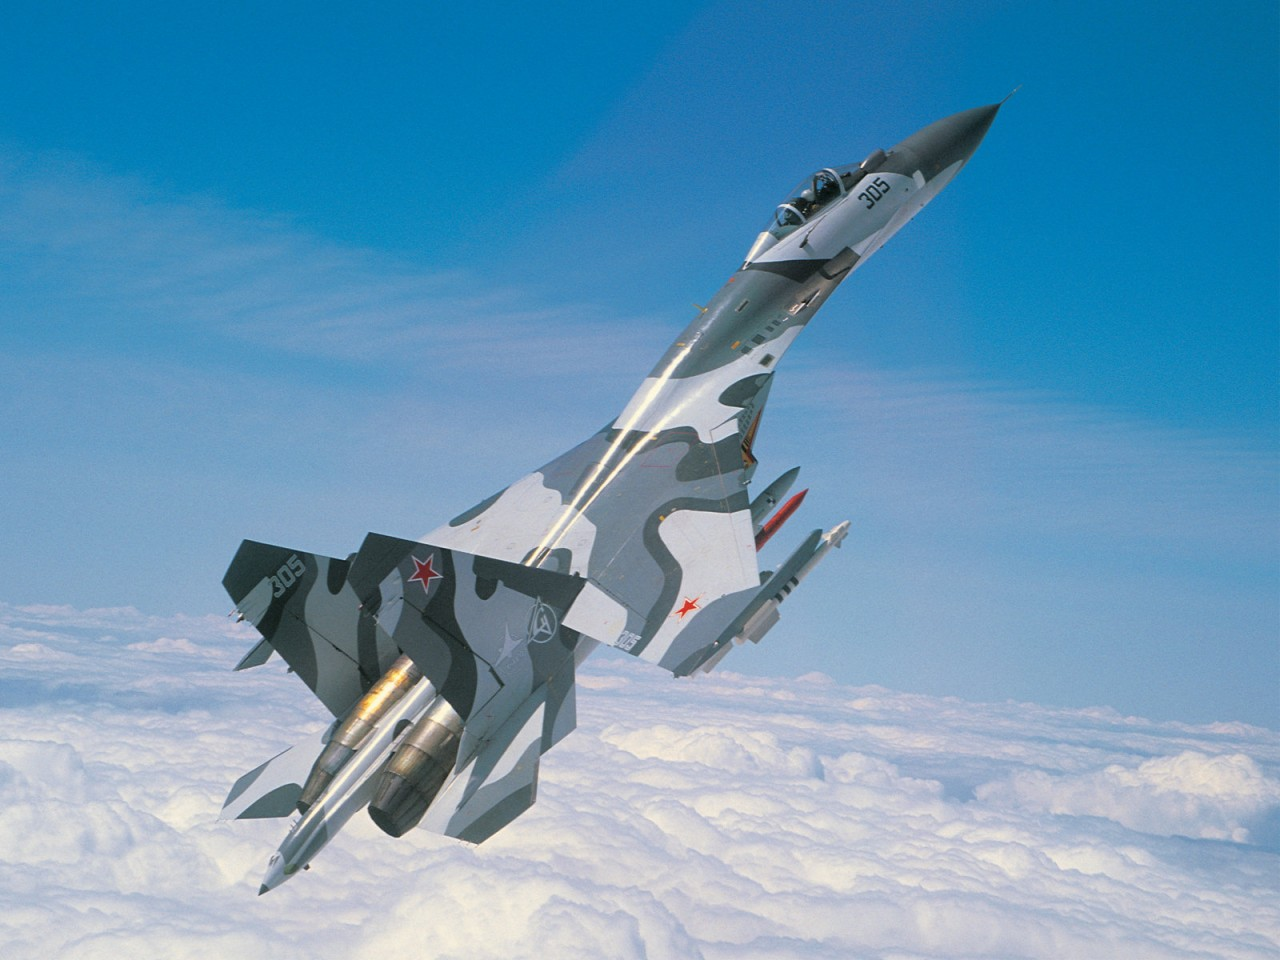 Иду на таран: как наш Су-27 атаковал самолет НАТО